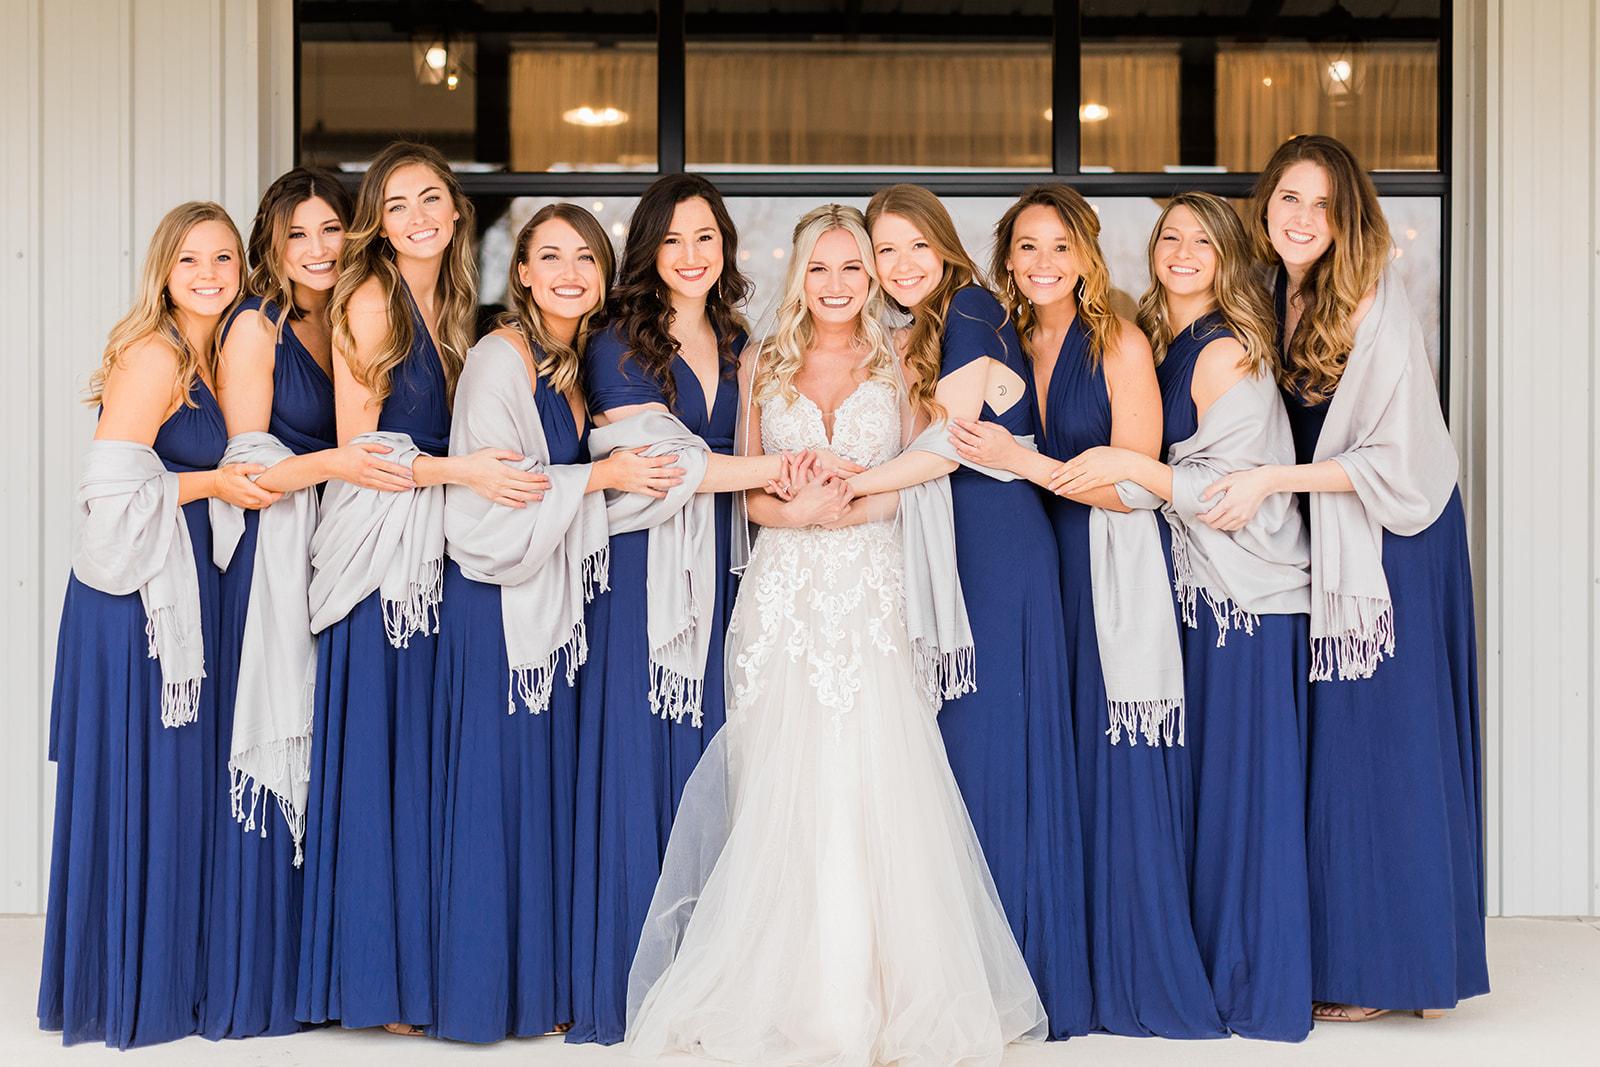 Bixby Tulsa Wedding Venues 17a.jpg